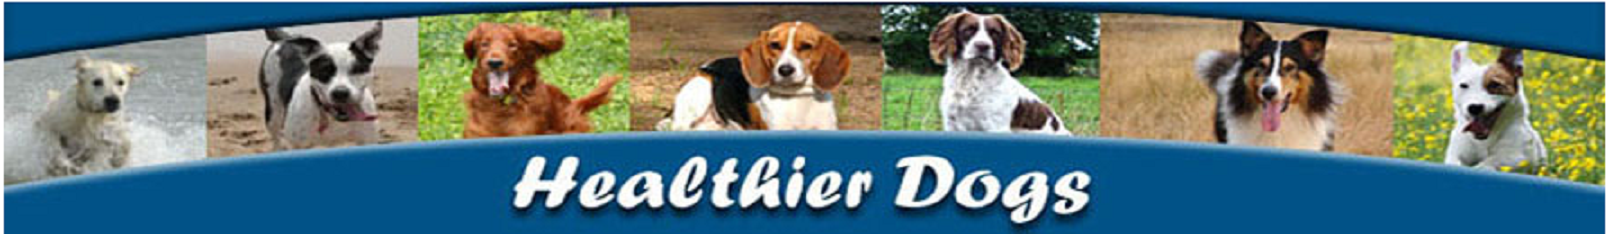 Best Dog Foods and Holistic Dog Health Remedies | HealthierDogs.com